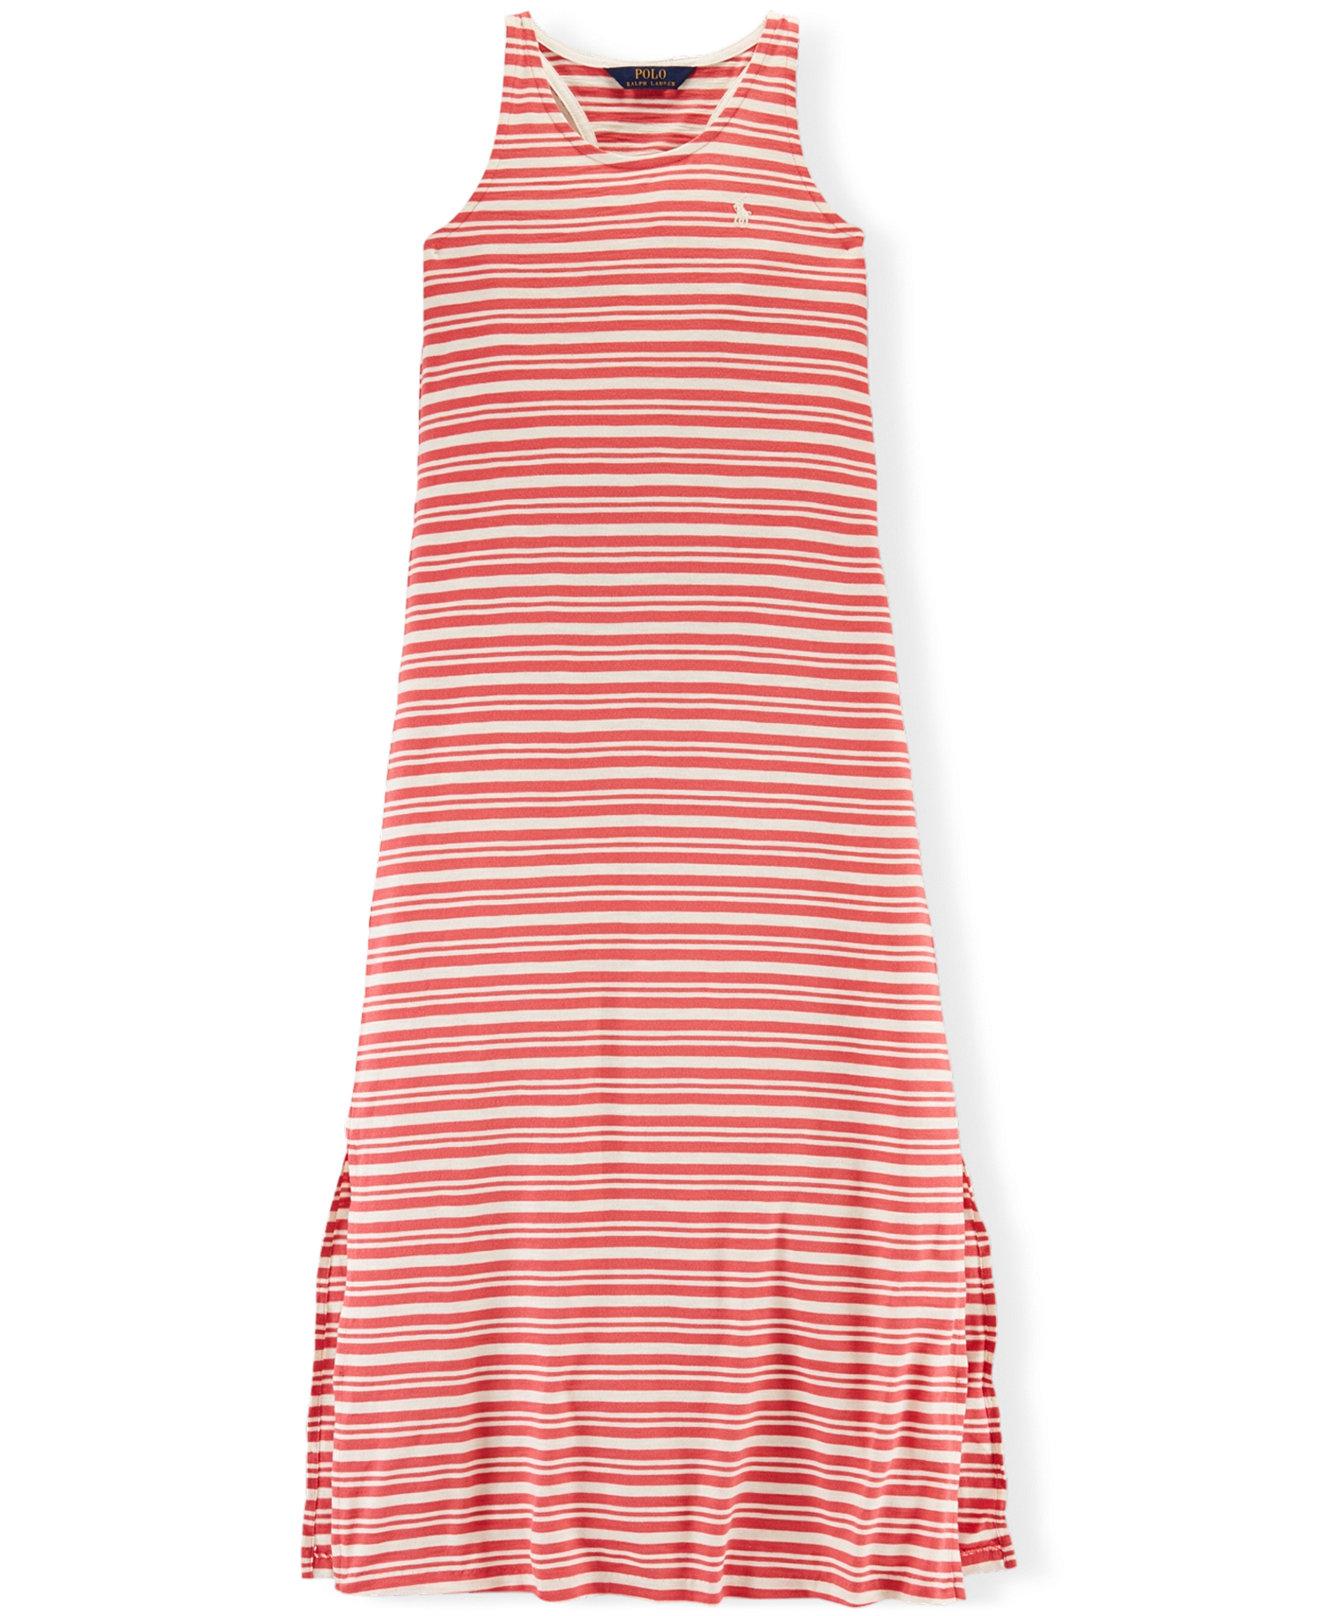 платье POLO BY RALPH LAUREN  2015 POLO L. lauren ralph lauren women s chunky knit turtleneck sweater l modern cream